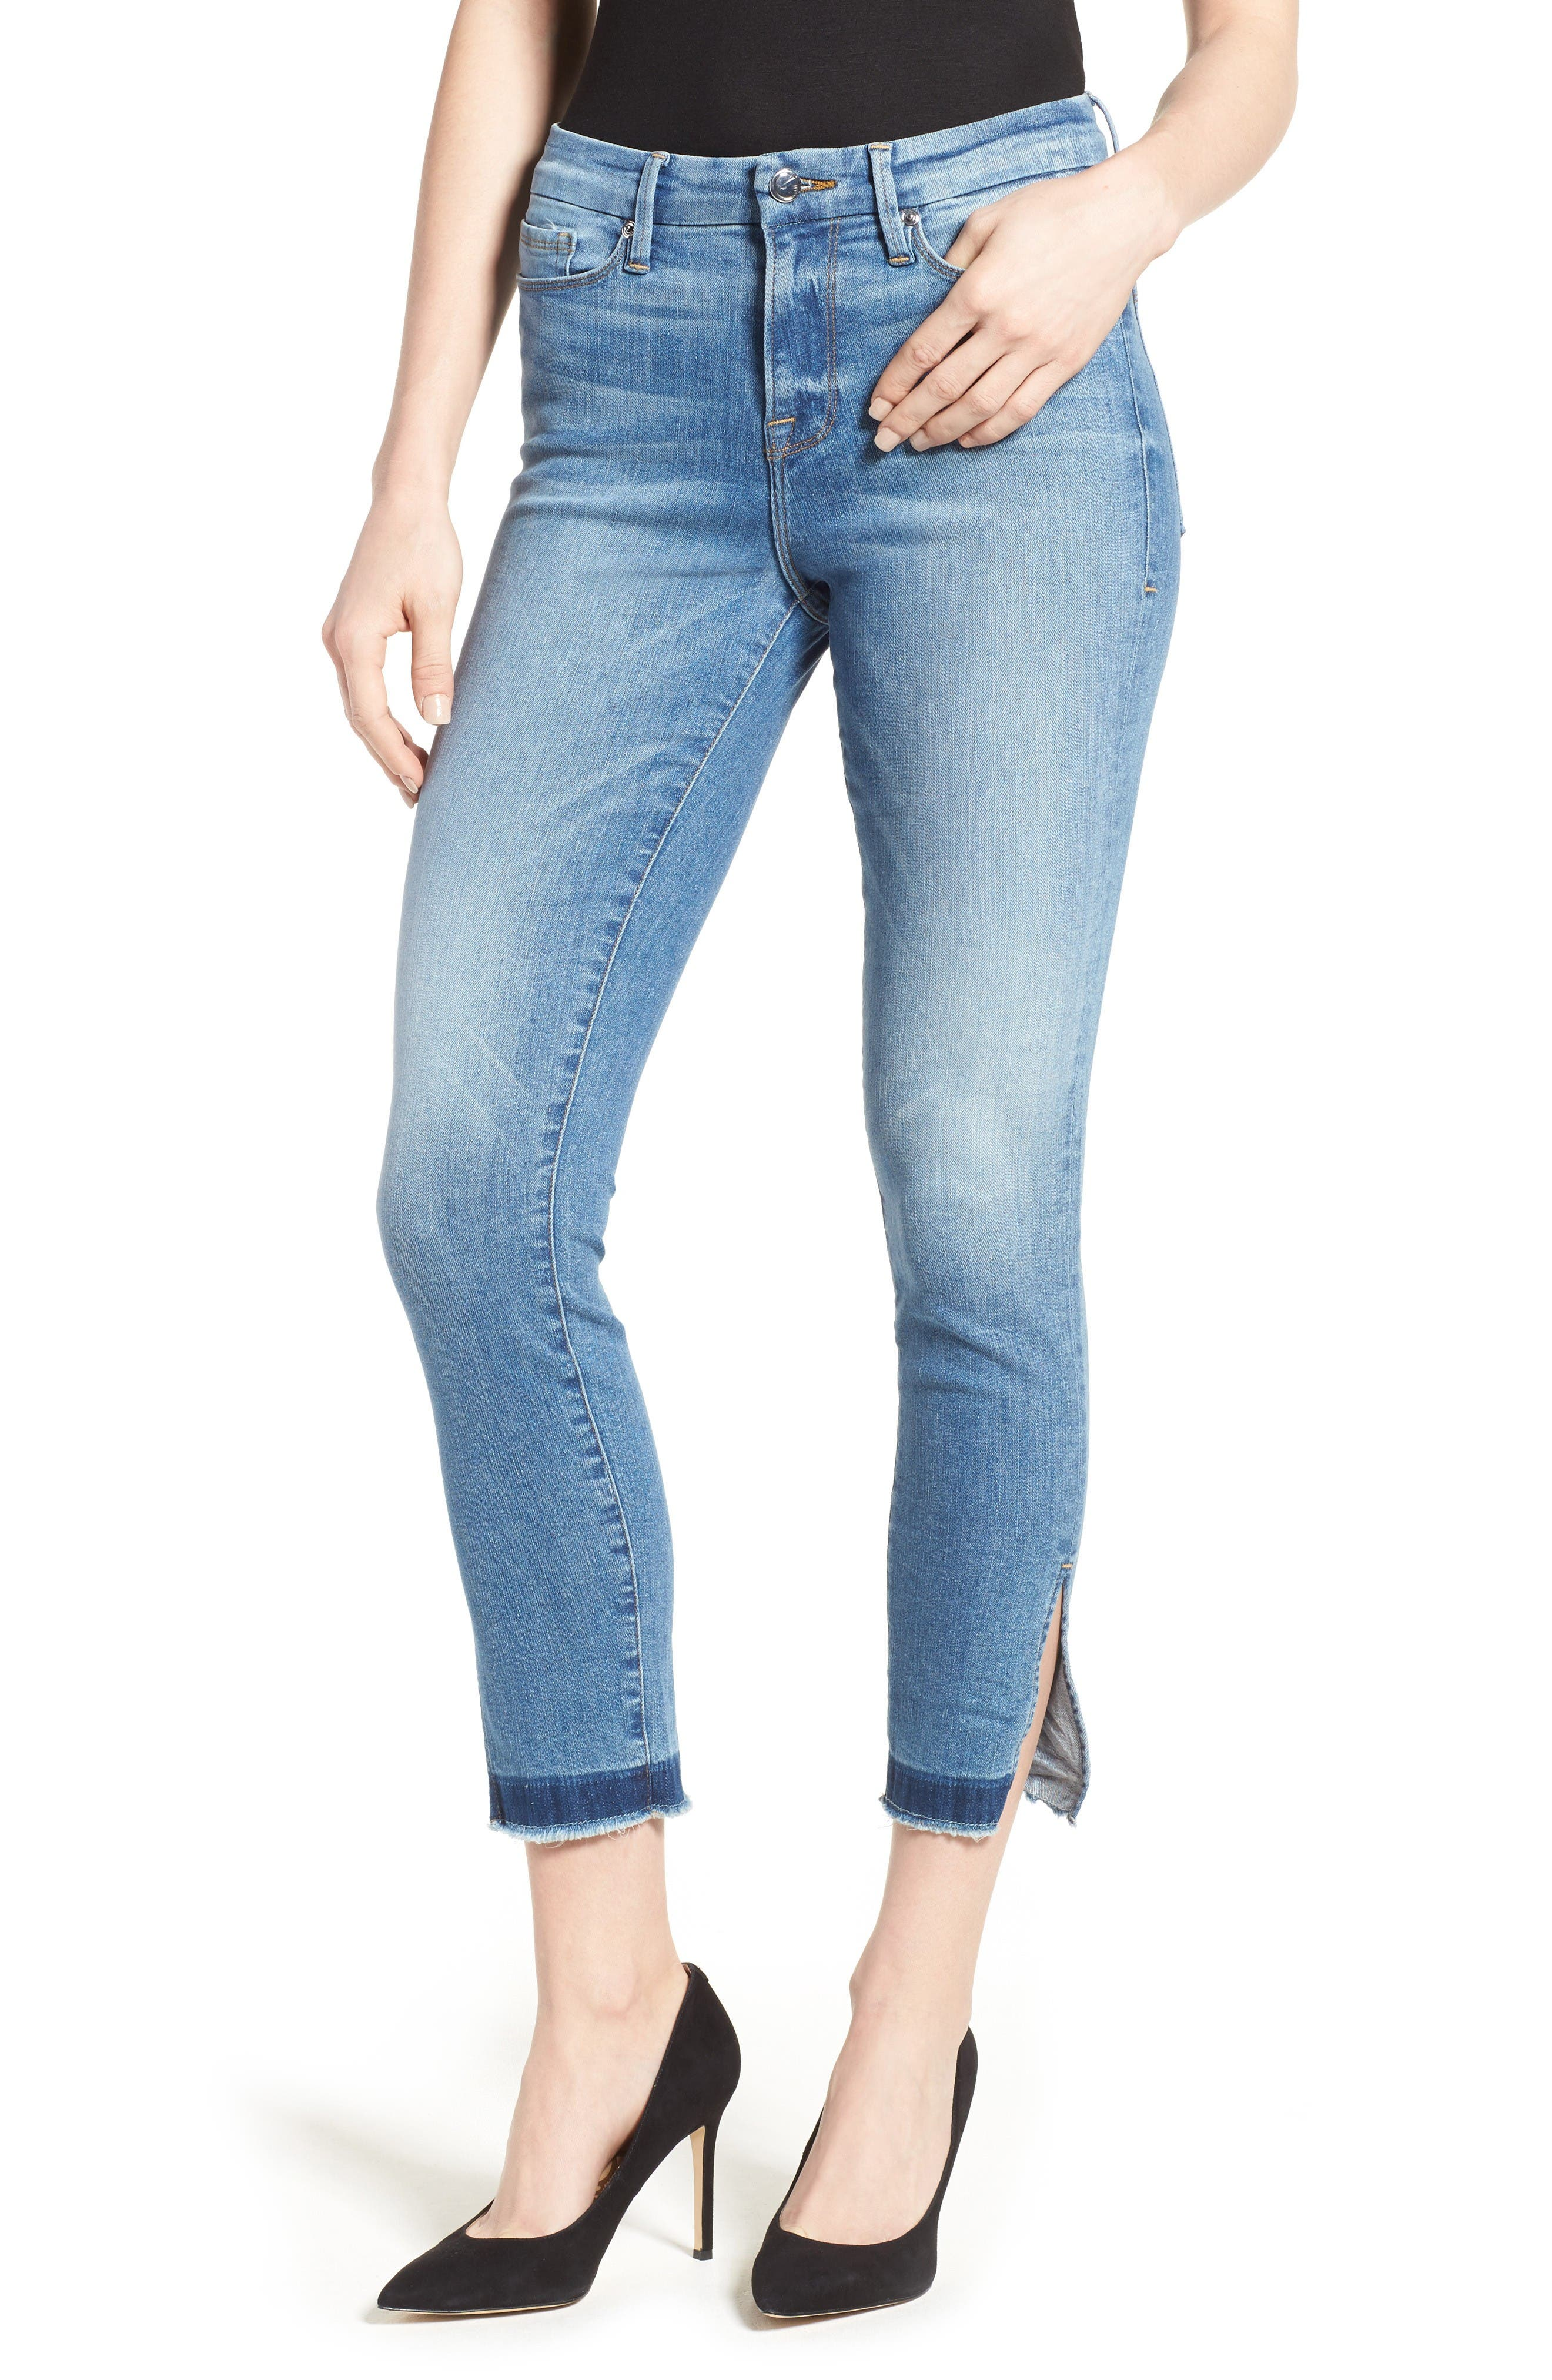 Main Image - Good American Good Legs High Rise Split Hem Crop Skinny Jeans (Blue 024) (Regular & Plus Size)